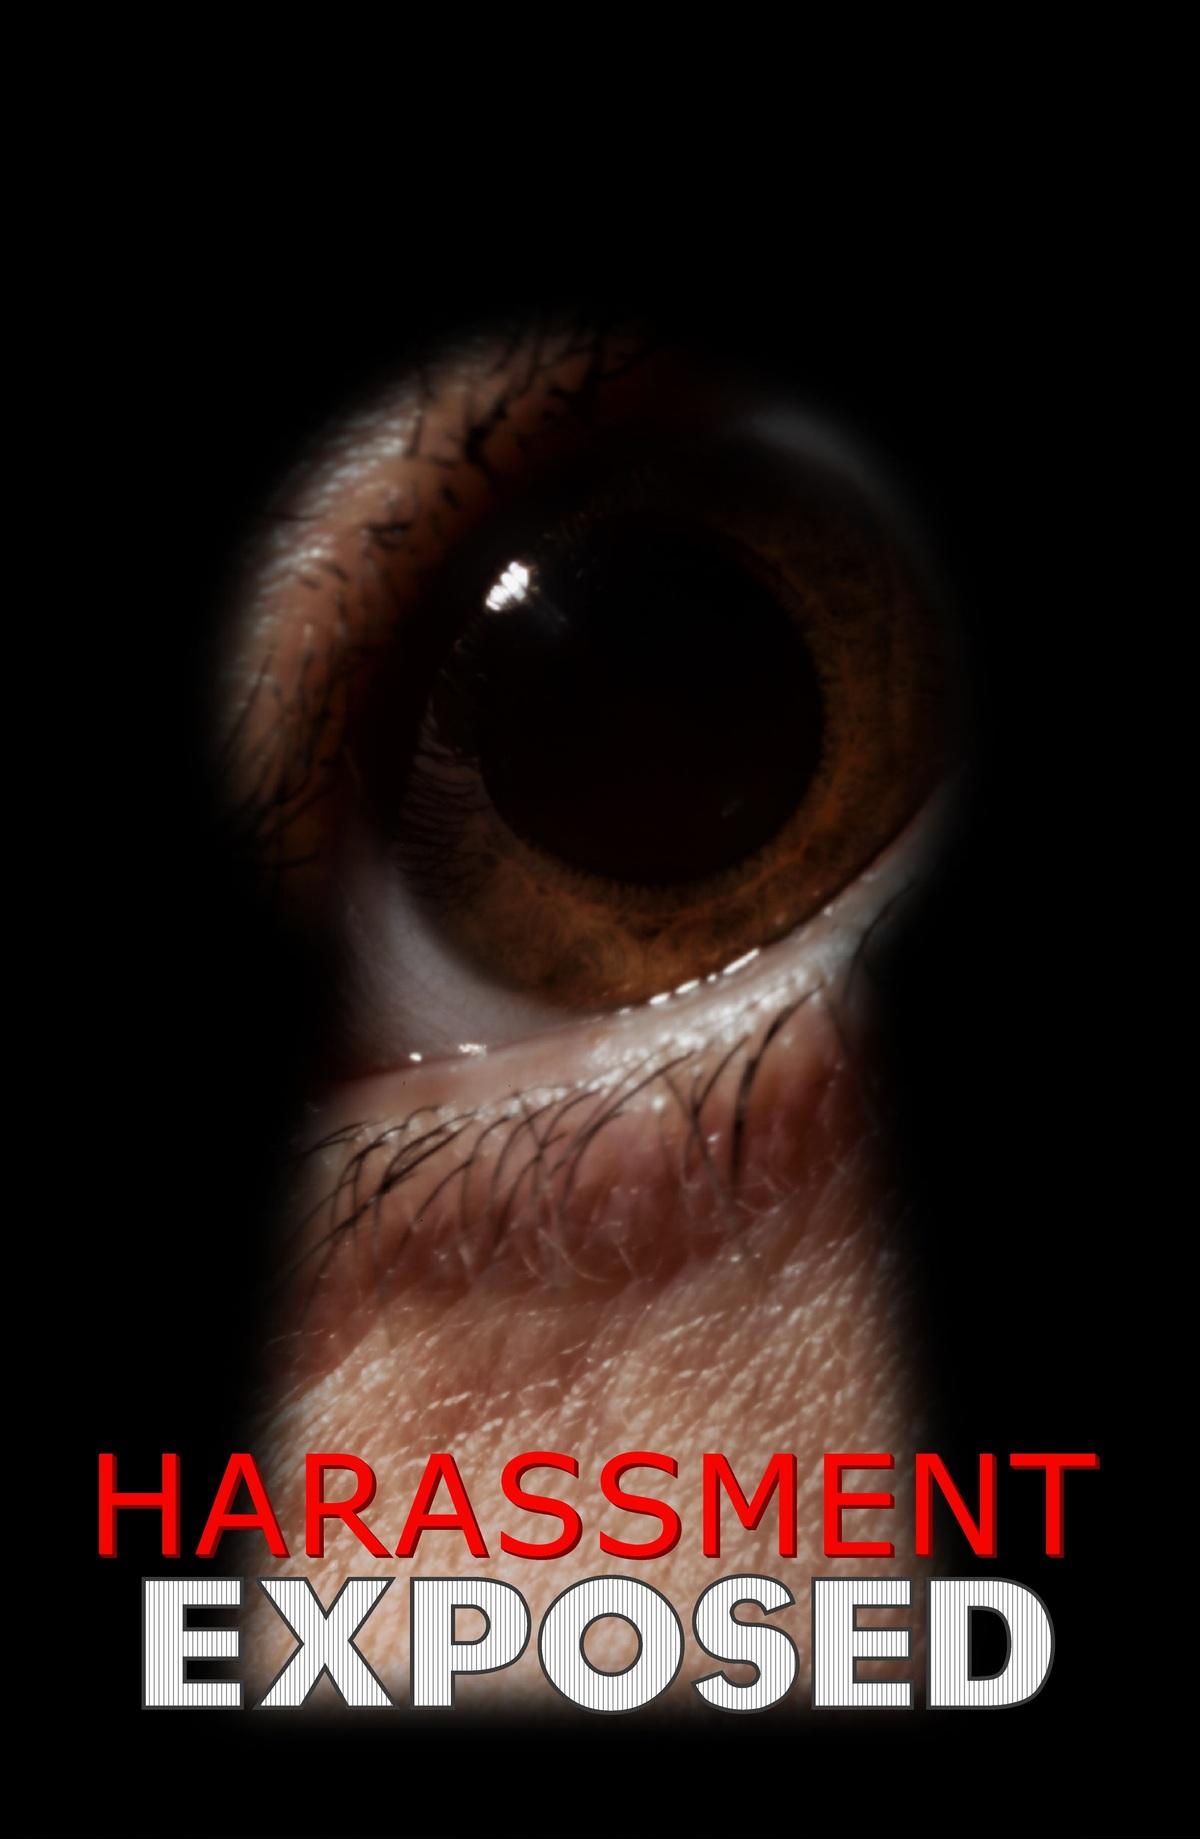 Harassment Exposed DVD